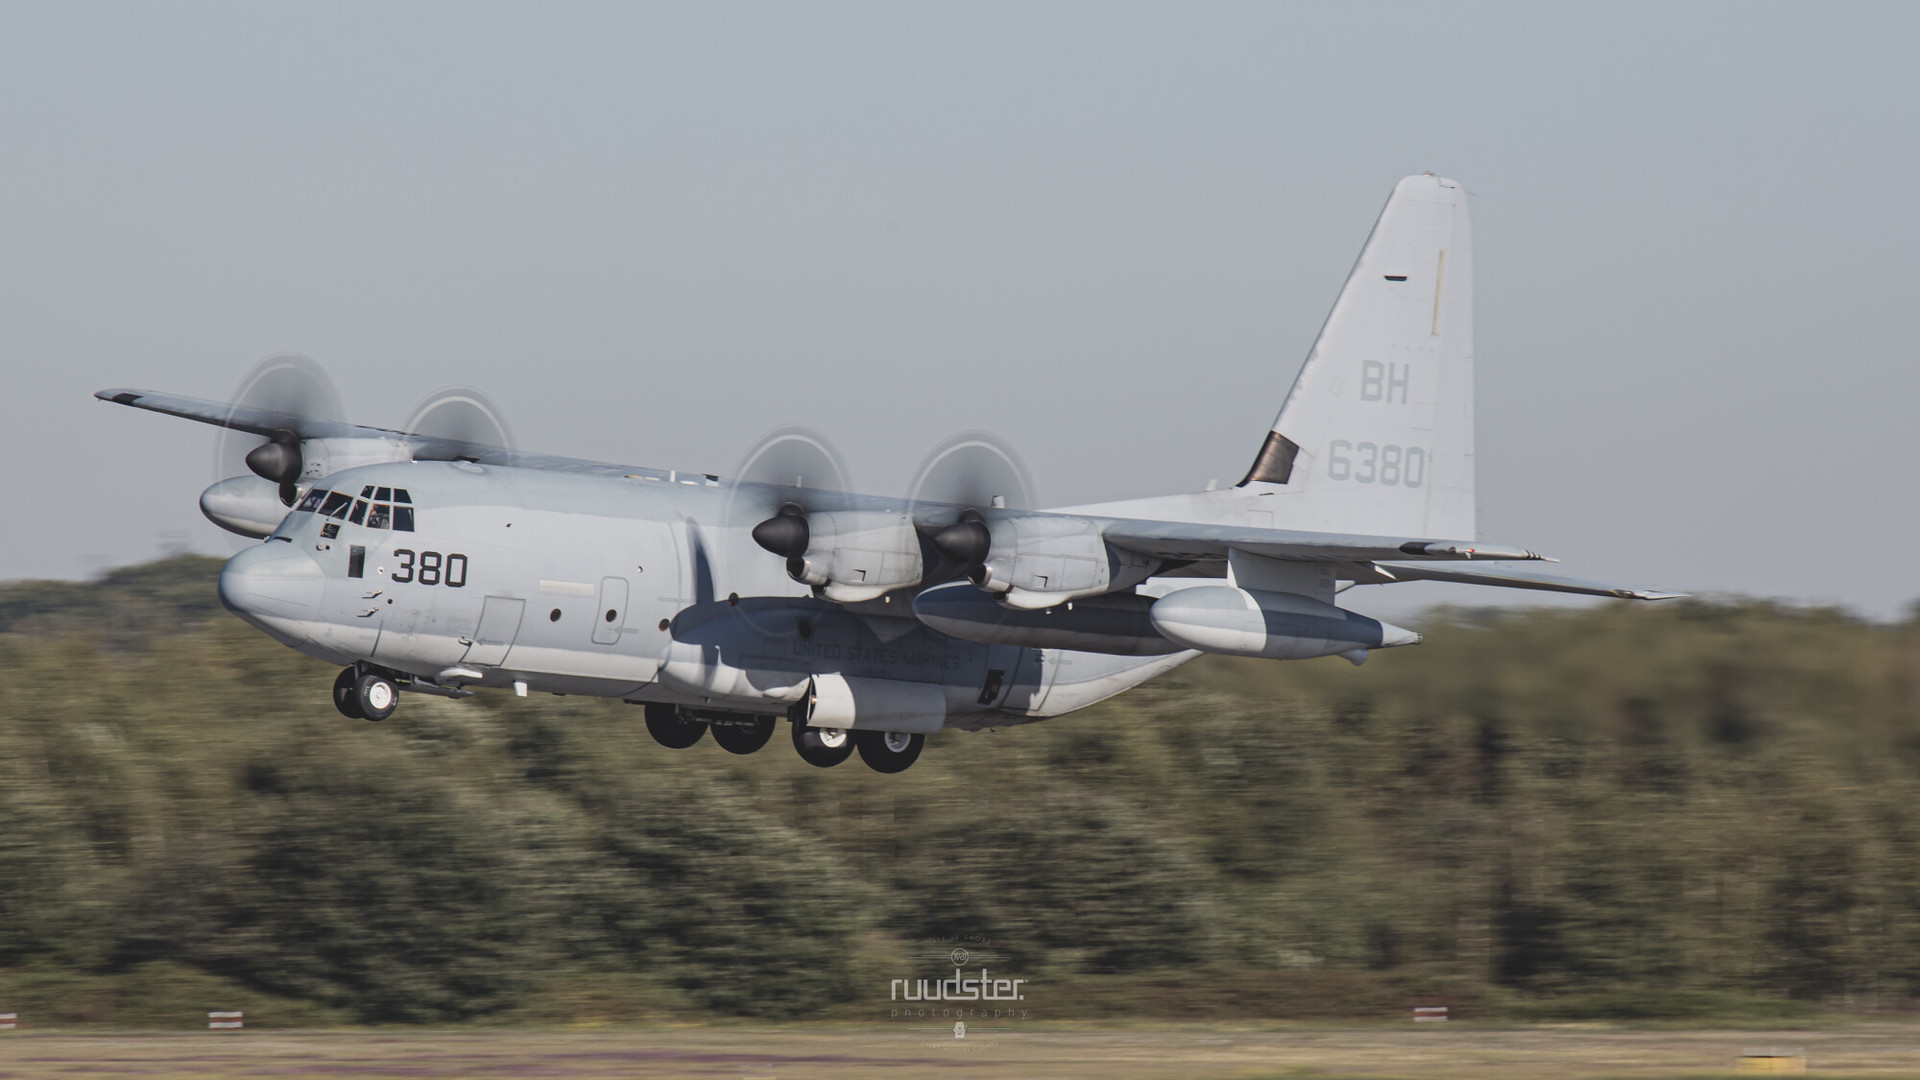 166380   Build: 2016 - Lockheed Martin KC-130J Hercules